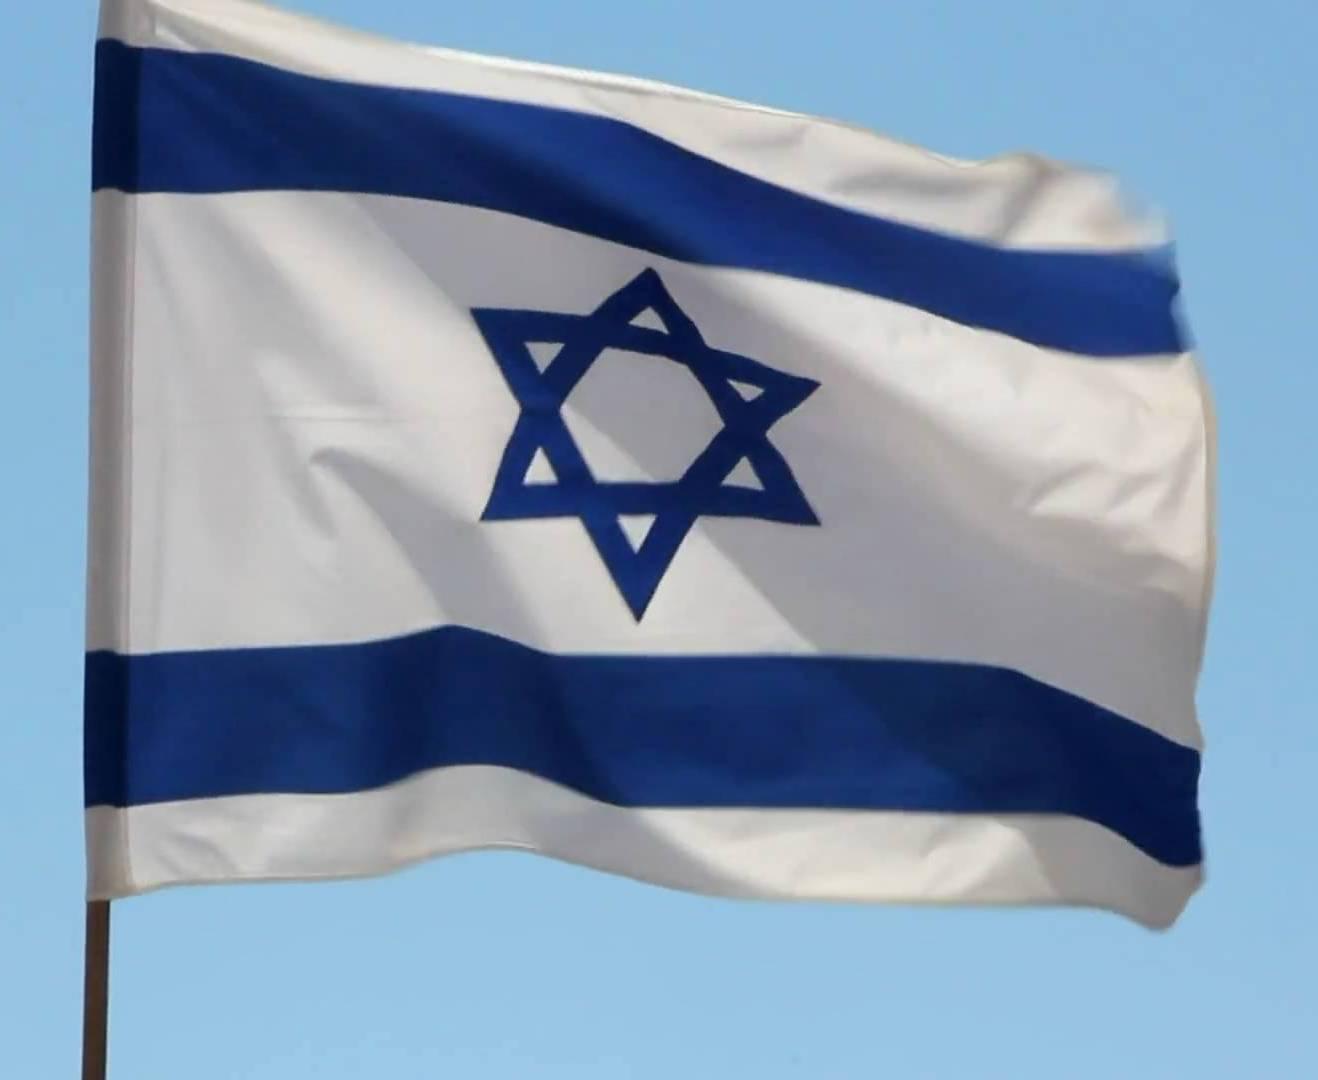 Flag Palestine 90 x 150 cm Cross hiss Flag National Flag early